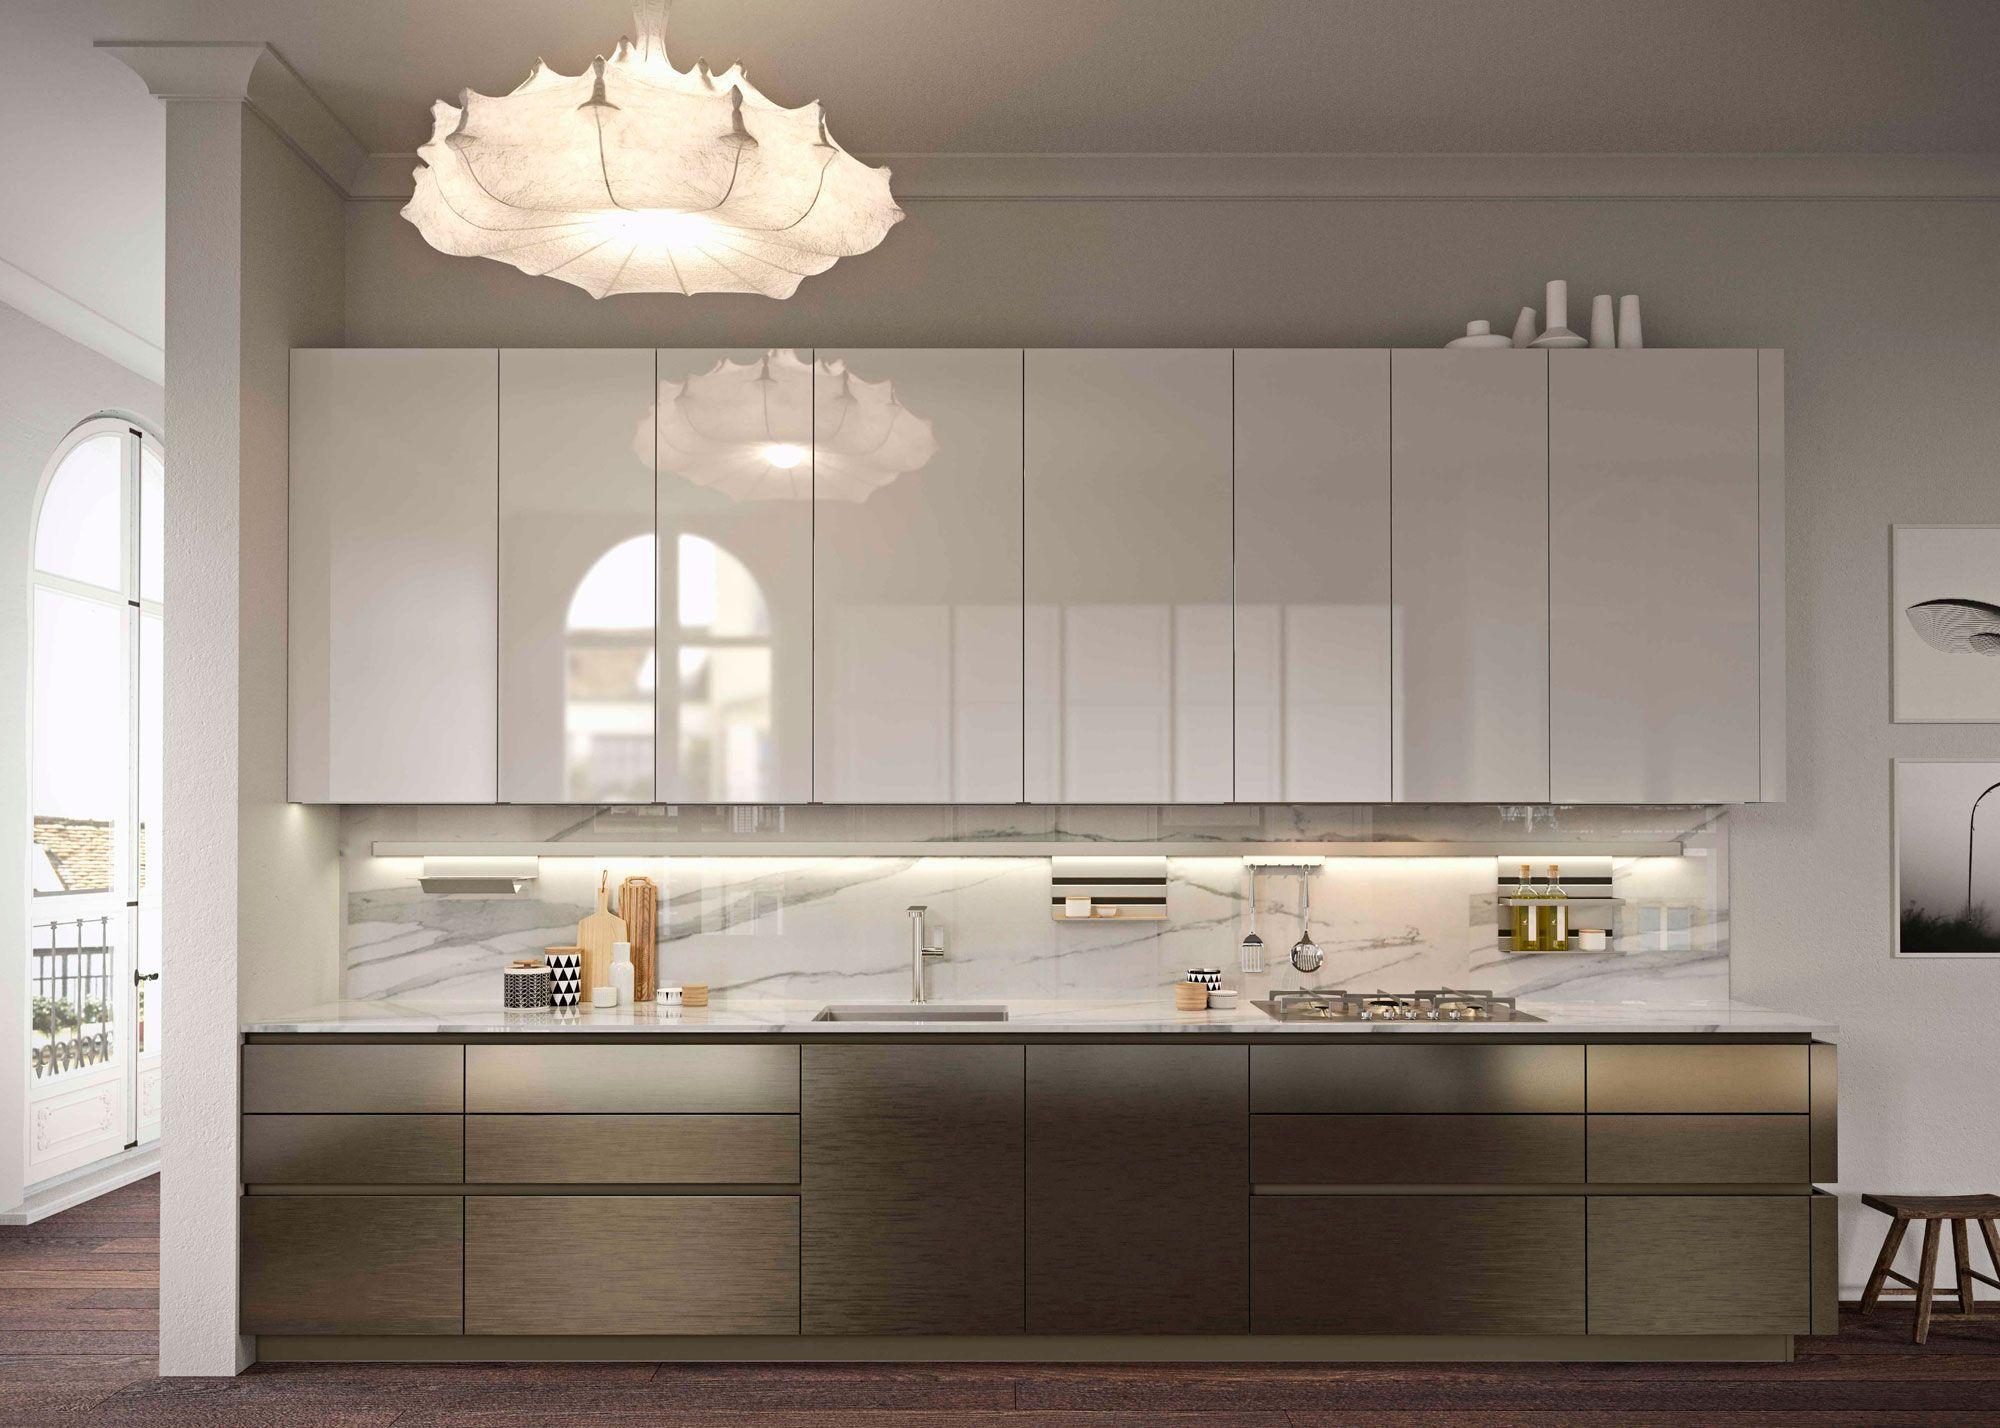 Interiors Modern KitchensModern Pin by